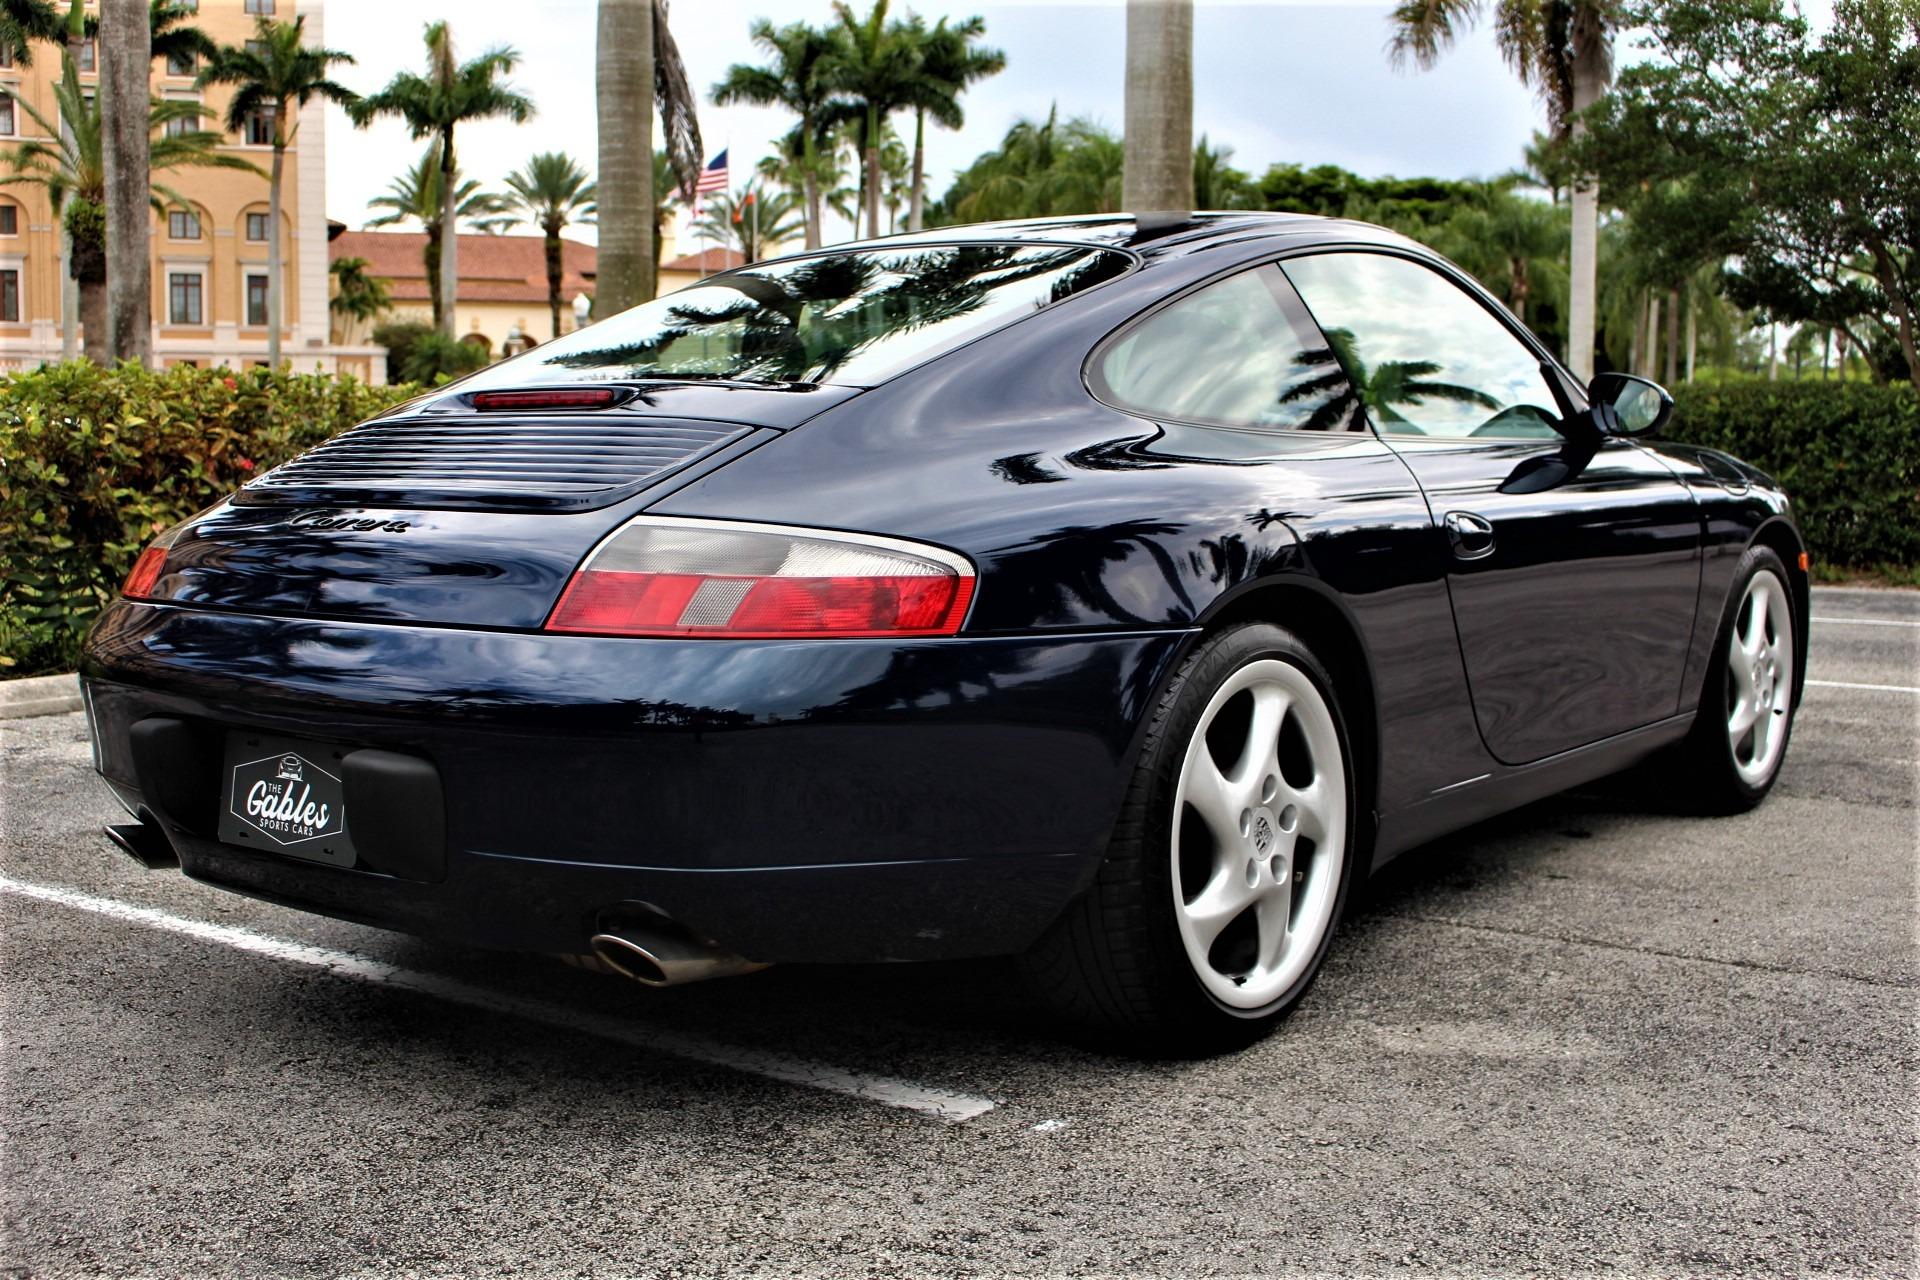 Used 2000 Porsche 911 Carrera for sale $39,850 at The Gables Sports Cars in Miami FL 33146 4